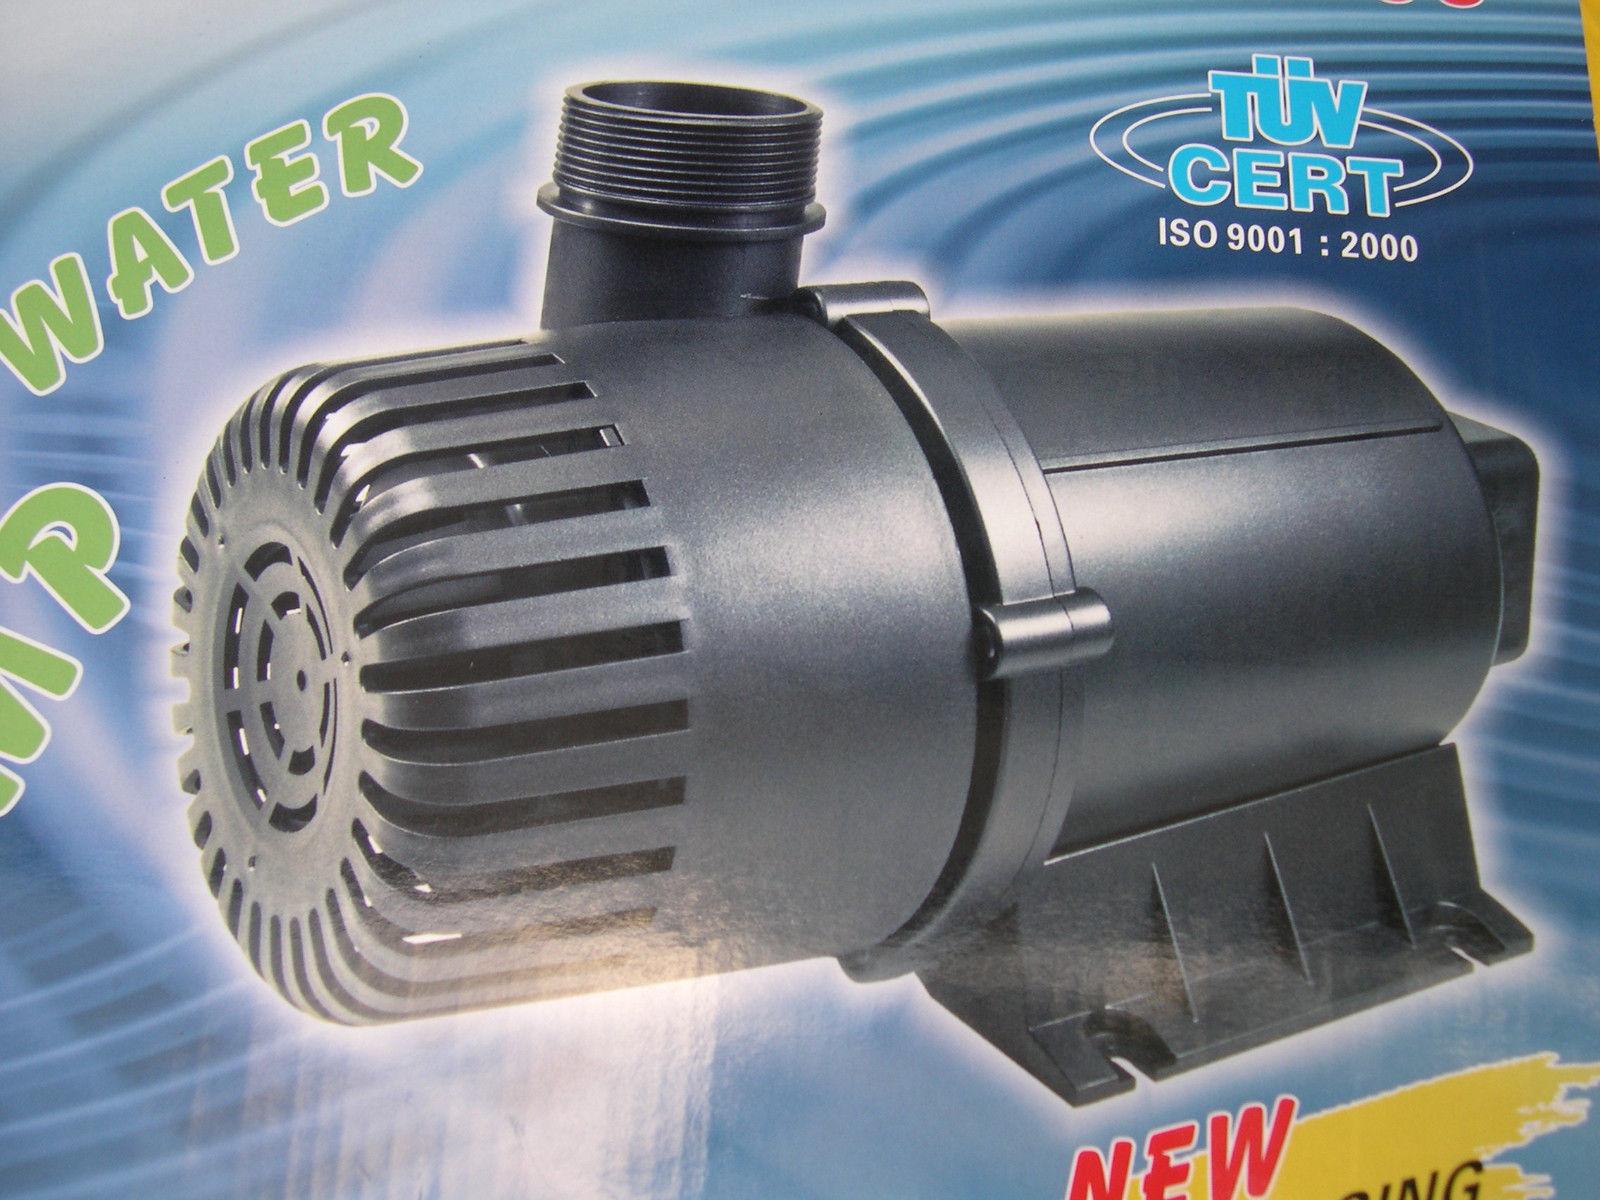 Profi filterspeisepumpe 18000 l h f teichfilter filter for Gartenteich ohne filter